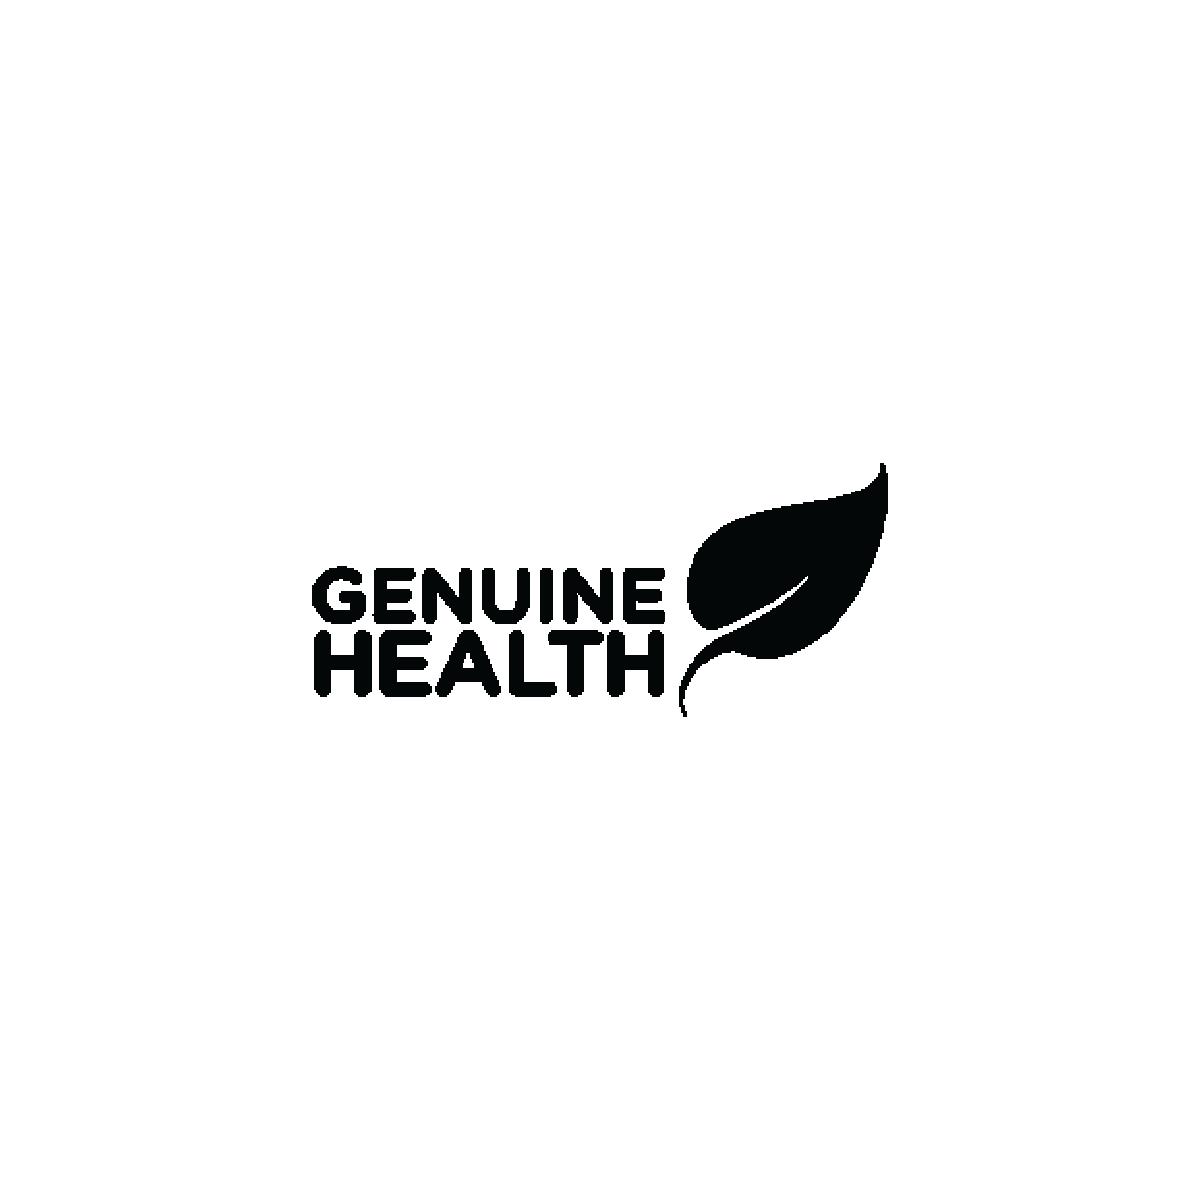 genuine-health.png